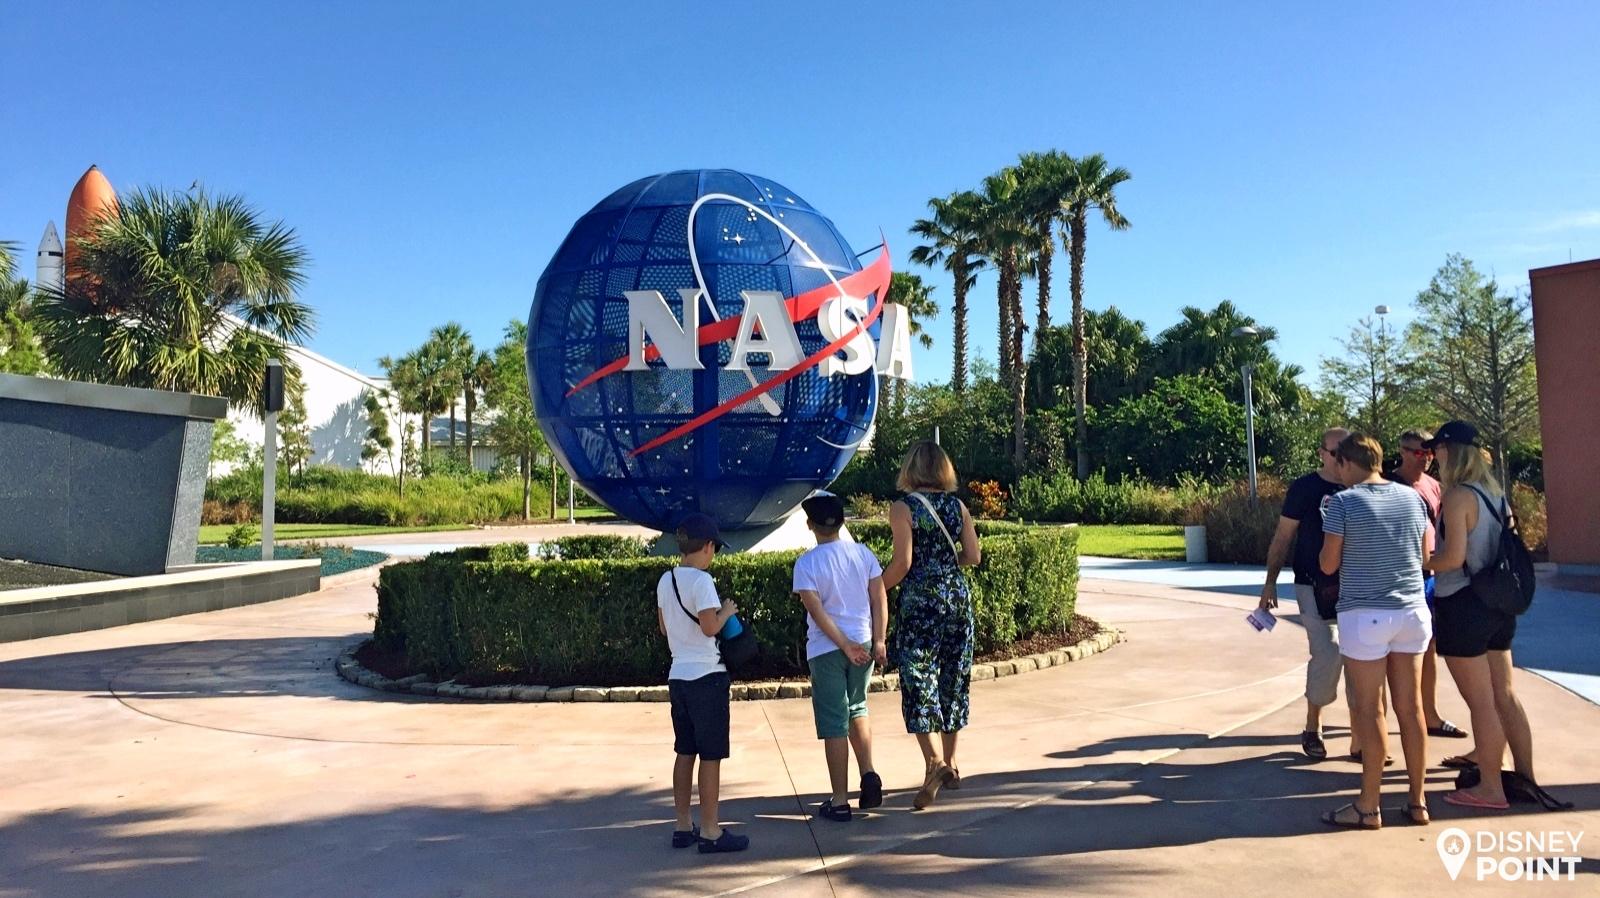 Disney Point Roteiro Kennedy Space Center Nasa Globo